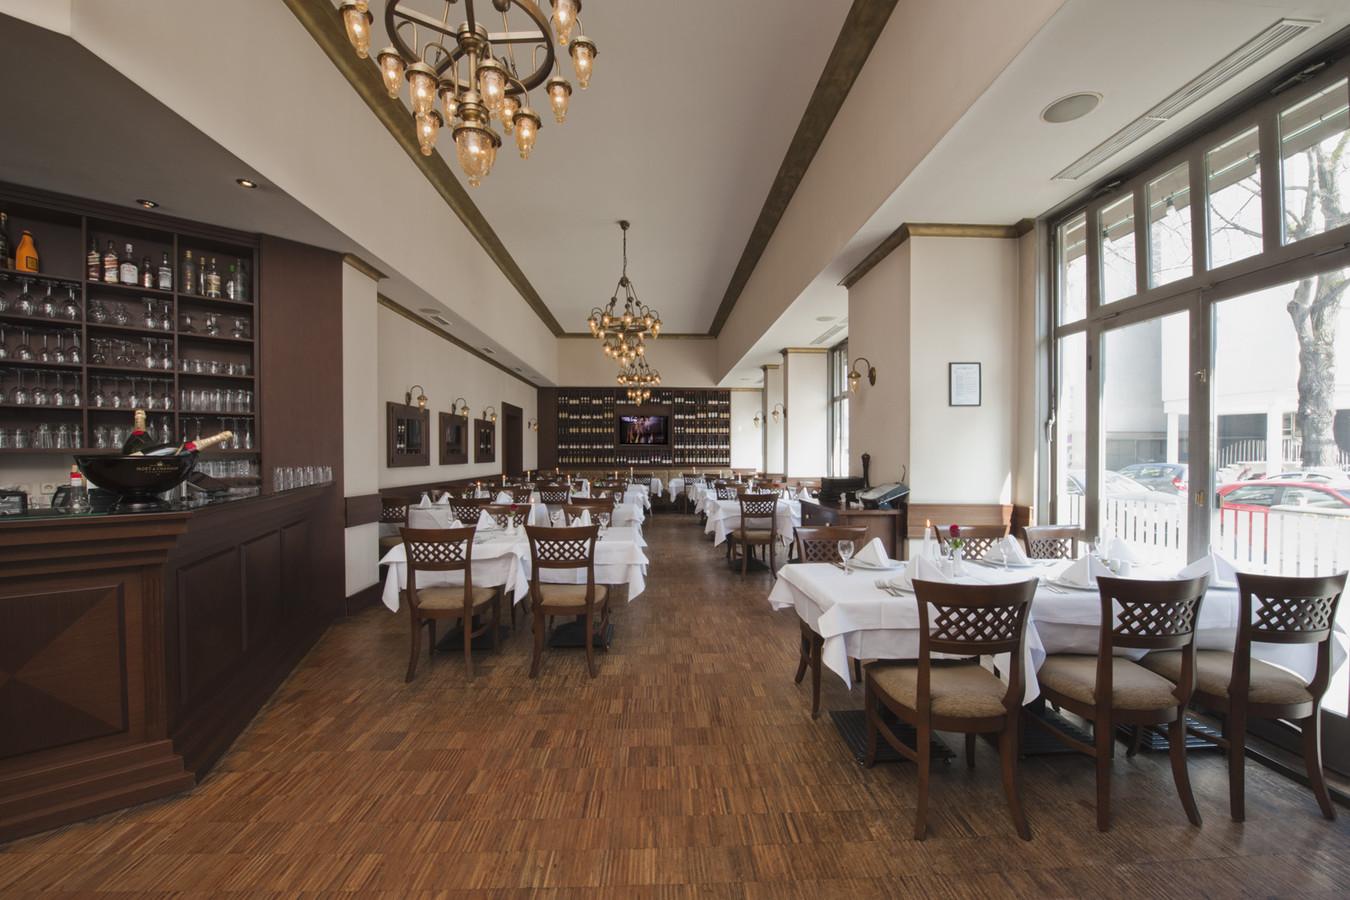 restaurant tugra t rkische spezialit ten in berlin charlottenburg. Black Bedroom Furniture Sets. Home Design Ideas